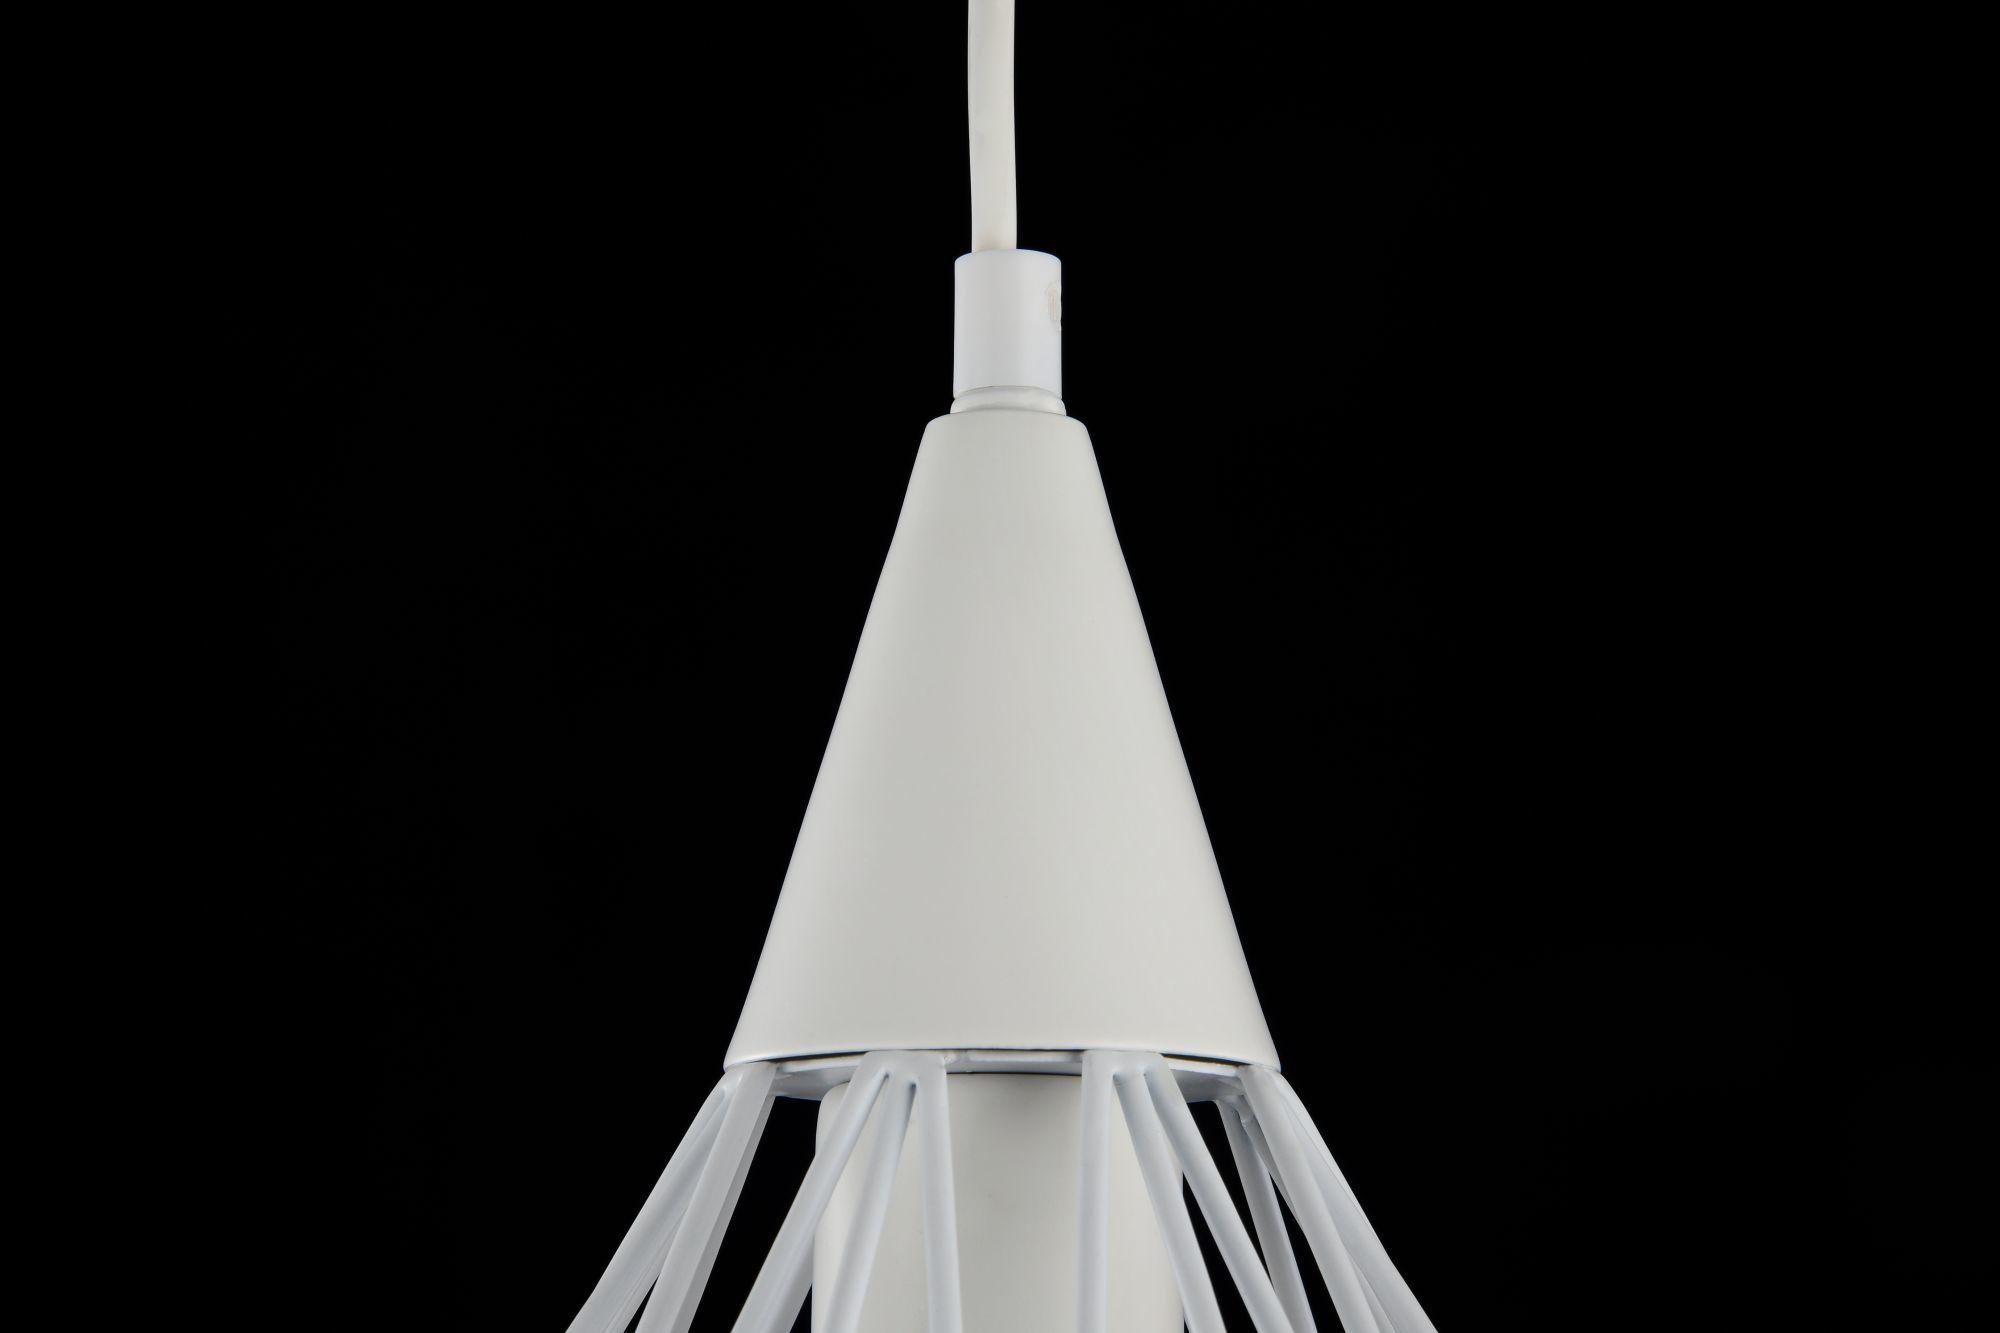 Подвесной светильник Maytoni Loft Calaf P360-PL-250-W (MOD360-01-W), 1xE27x60W, белый, металл - фото 4